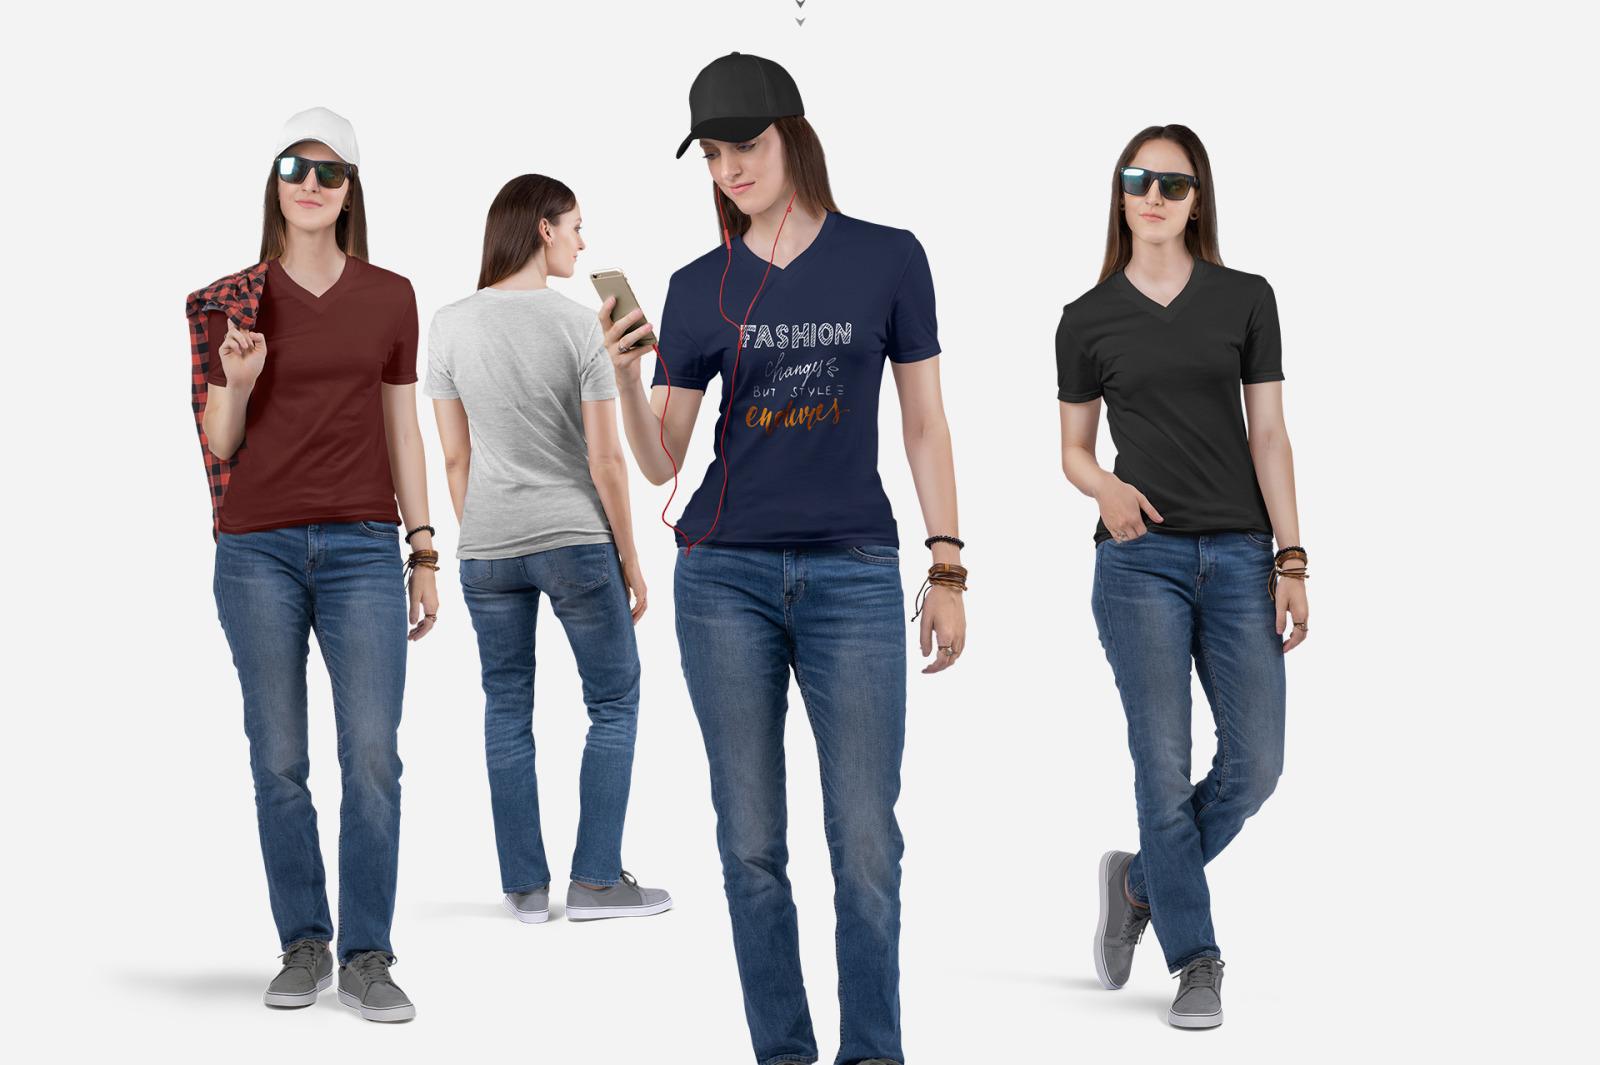 Women's V Neck T-Shirt Mockup Set